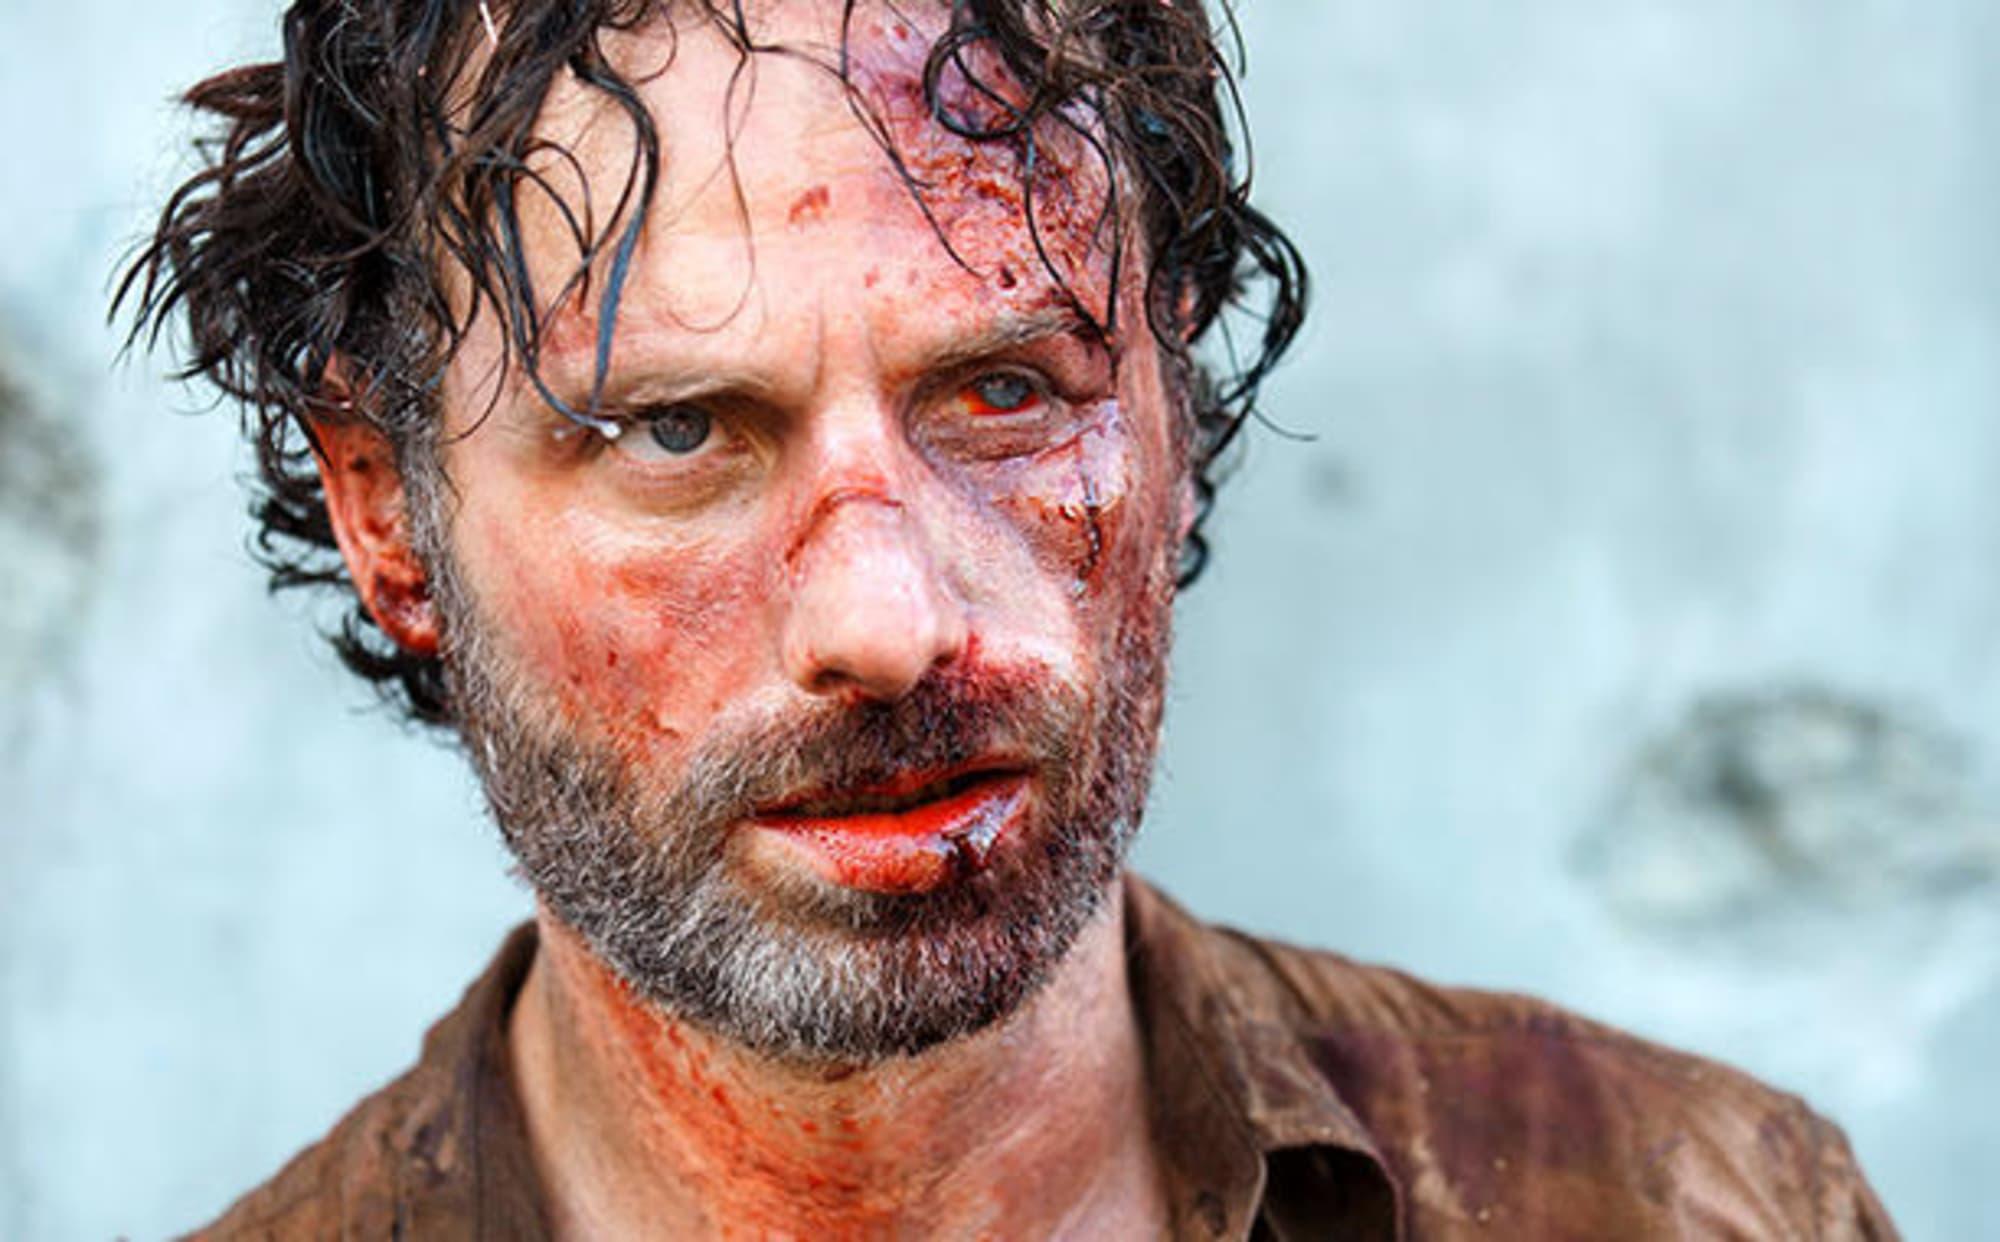 Exclusive Deleted Scene Clip from Walking Dead Season 9 - LRM